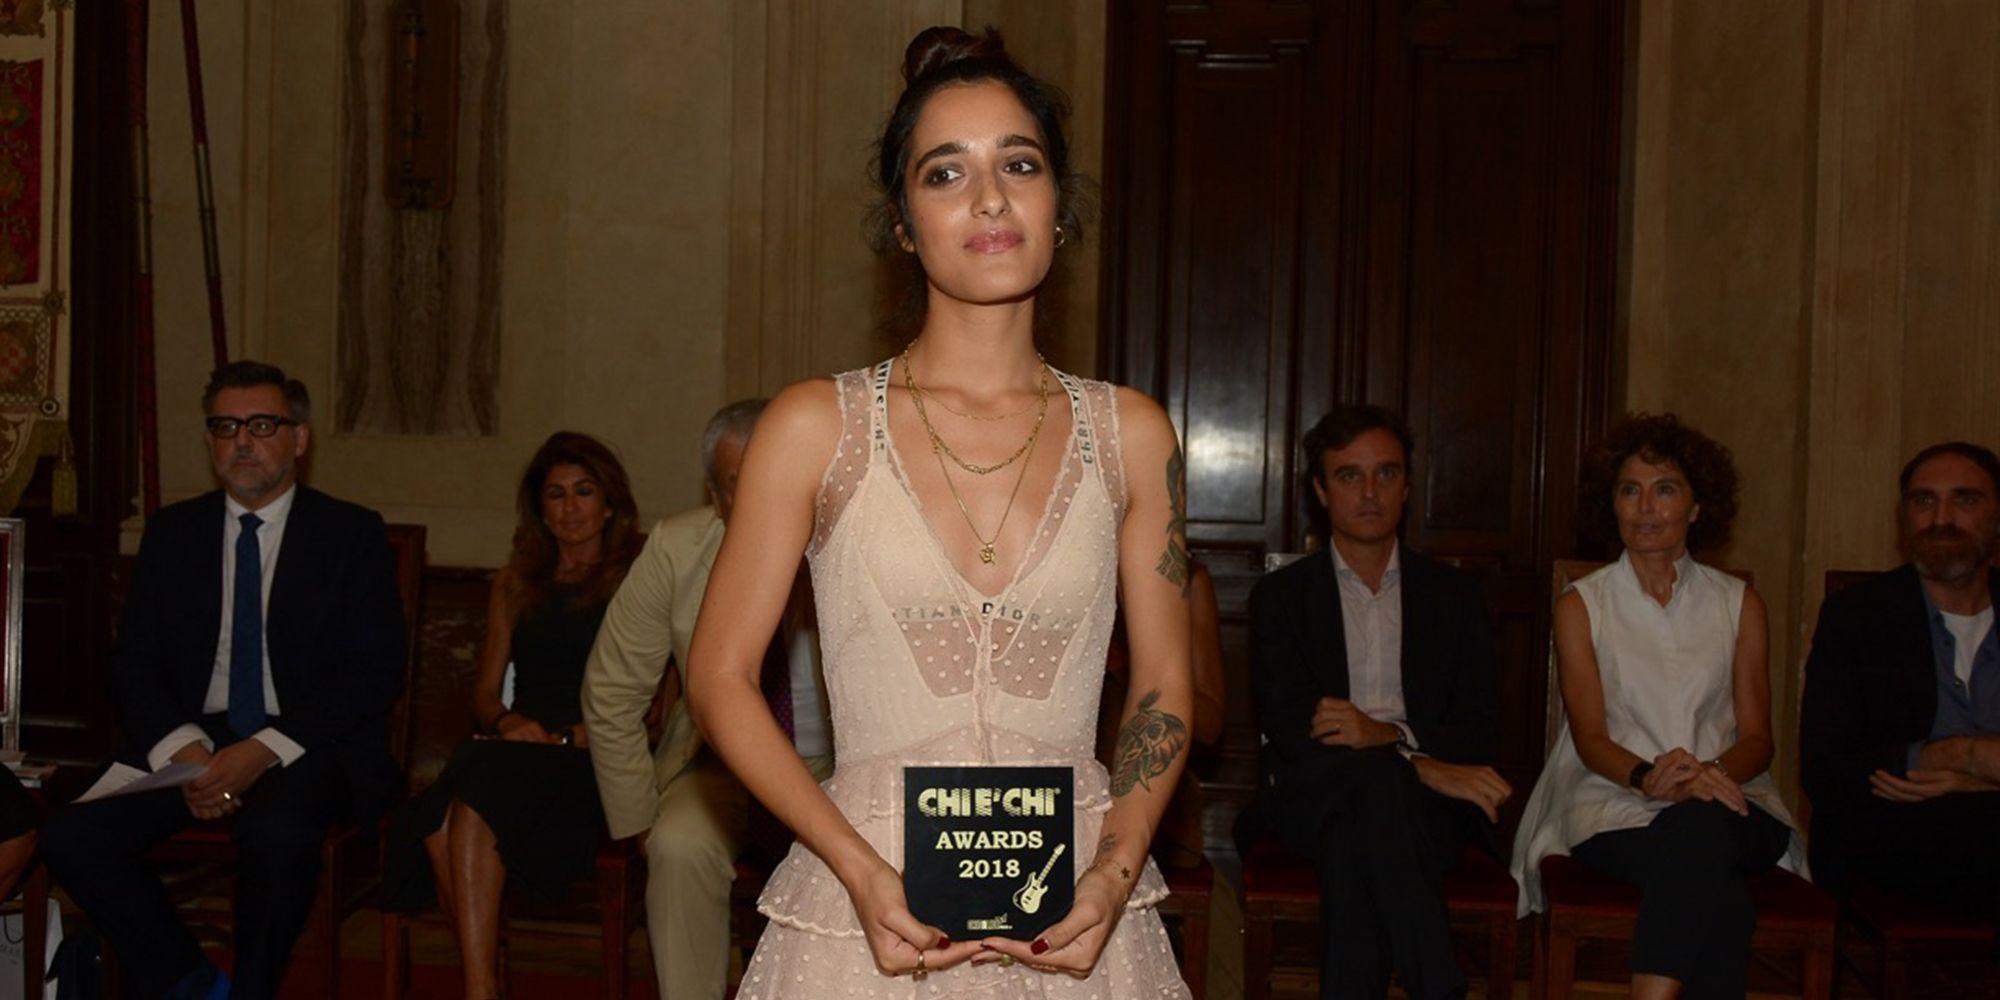 Forum on this topic: Il premio Hearst Film Award 2019 come , il-premio-hearst-film-award-2019-come/